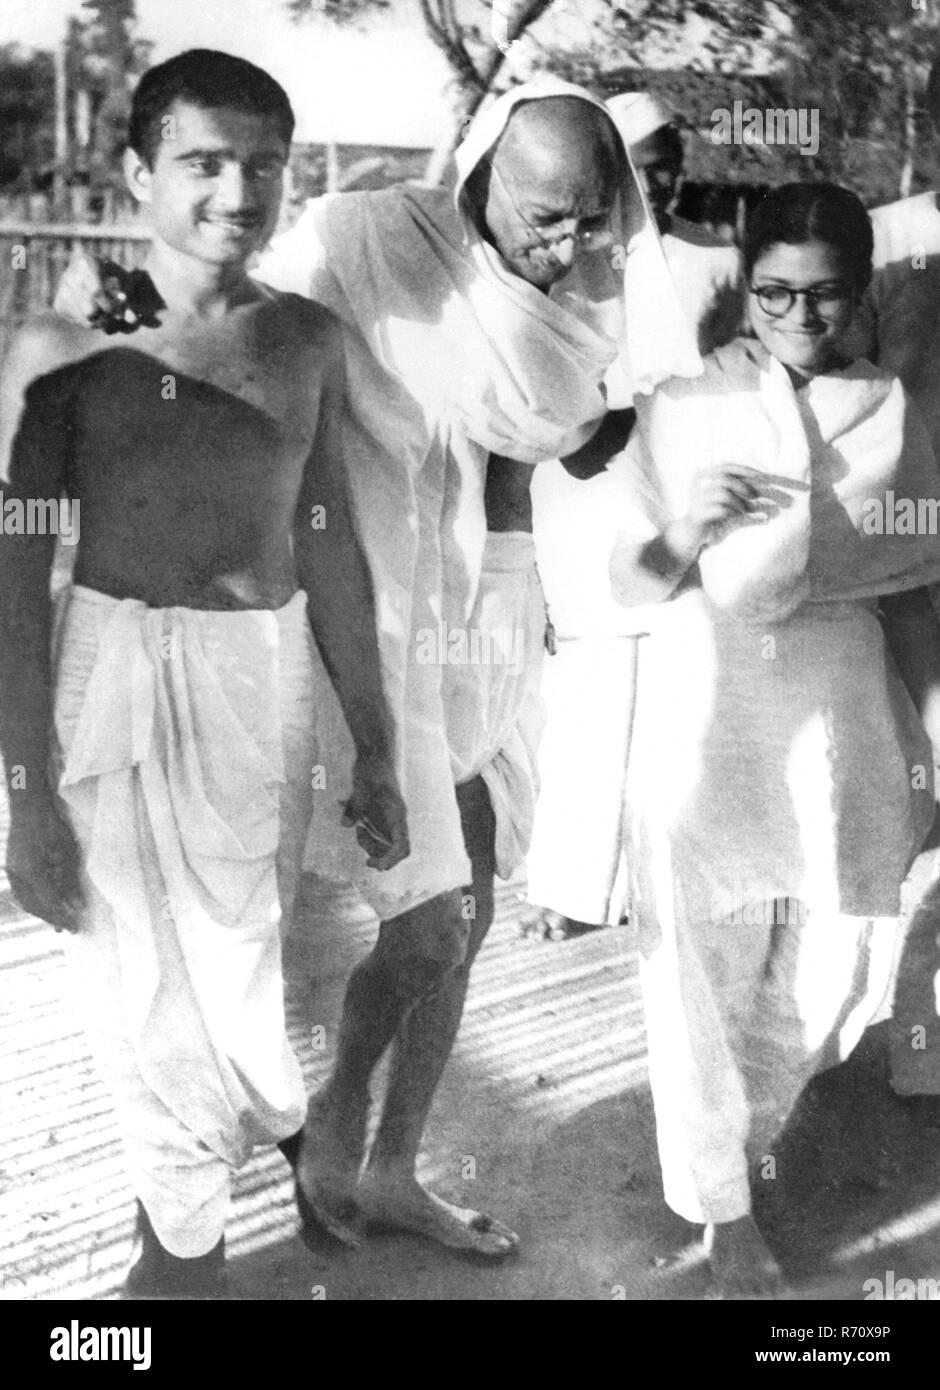 Mahatma Gandhi walking with Abha and Kanu Gandhi (left) - MODEL RELEASE NOT AVAILABLE - Stock Image